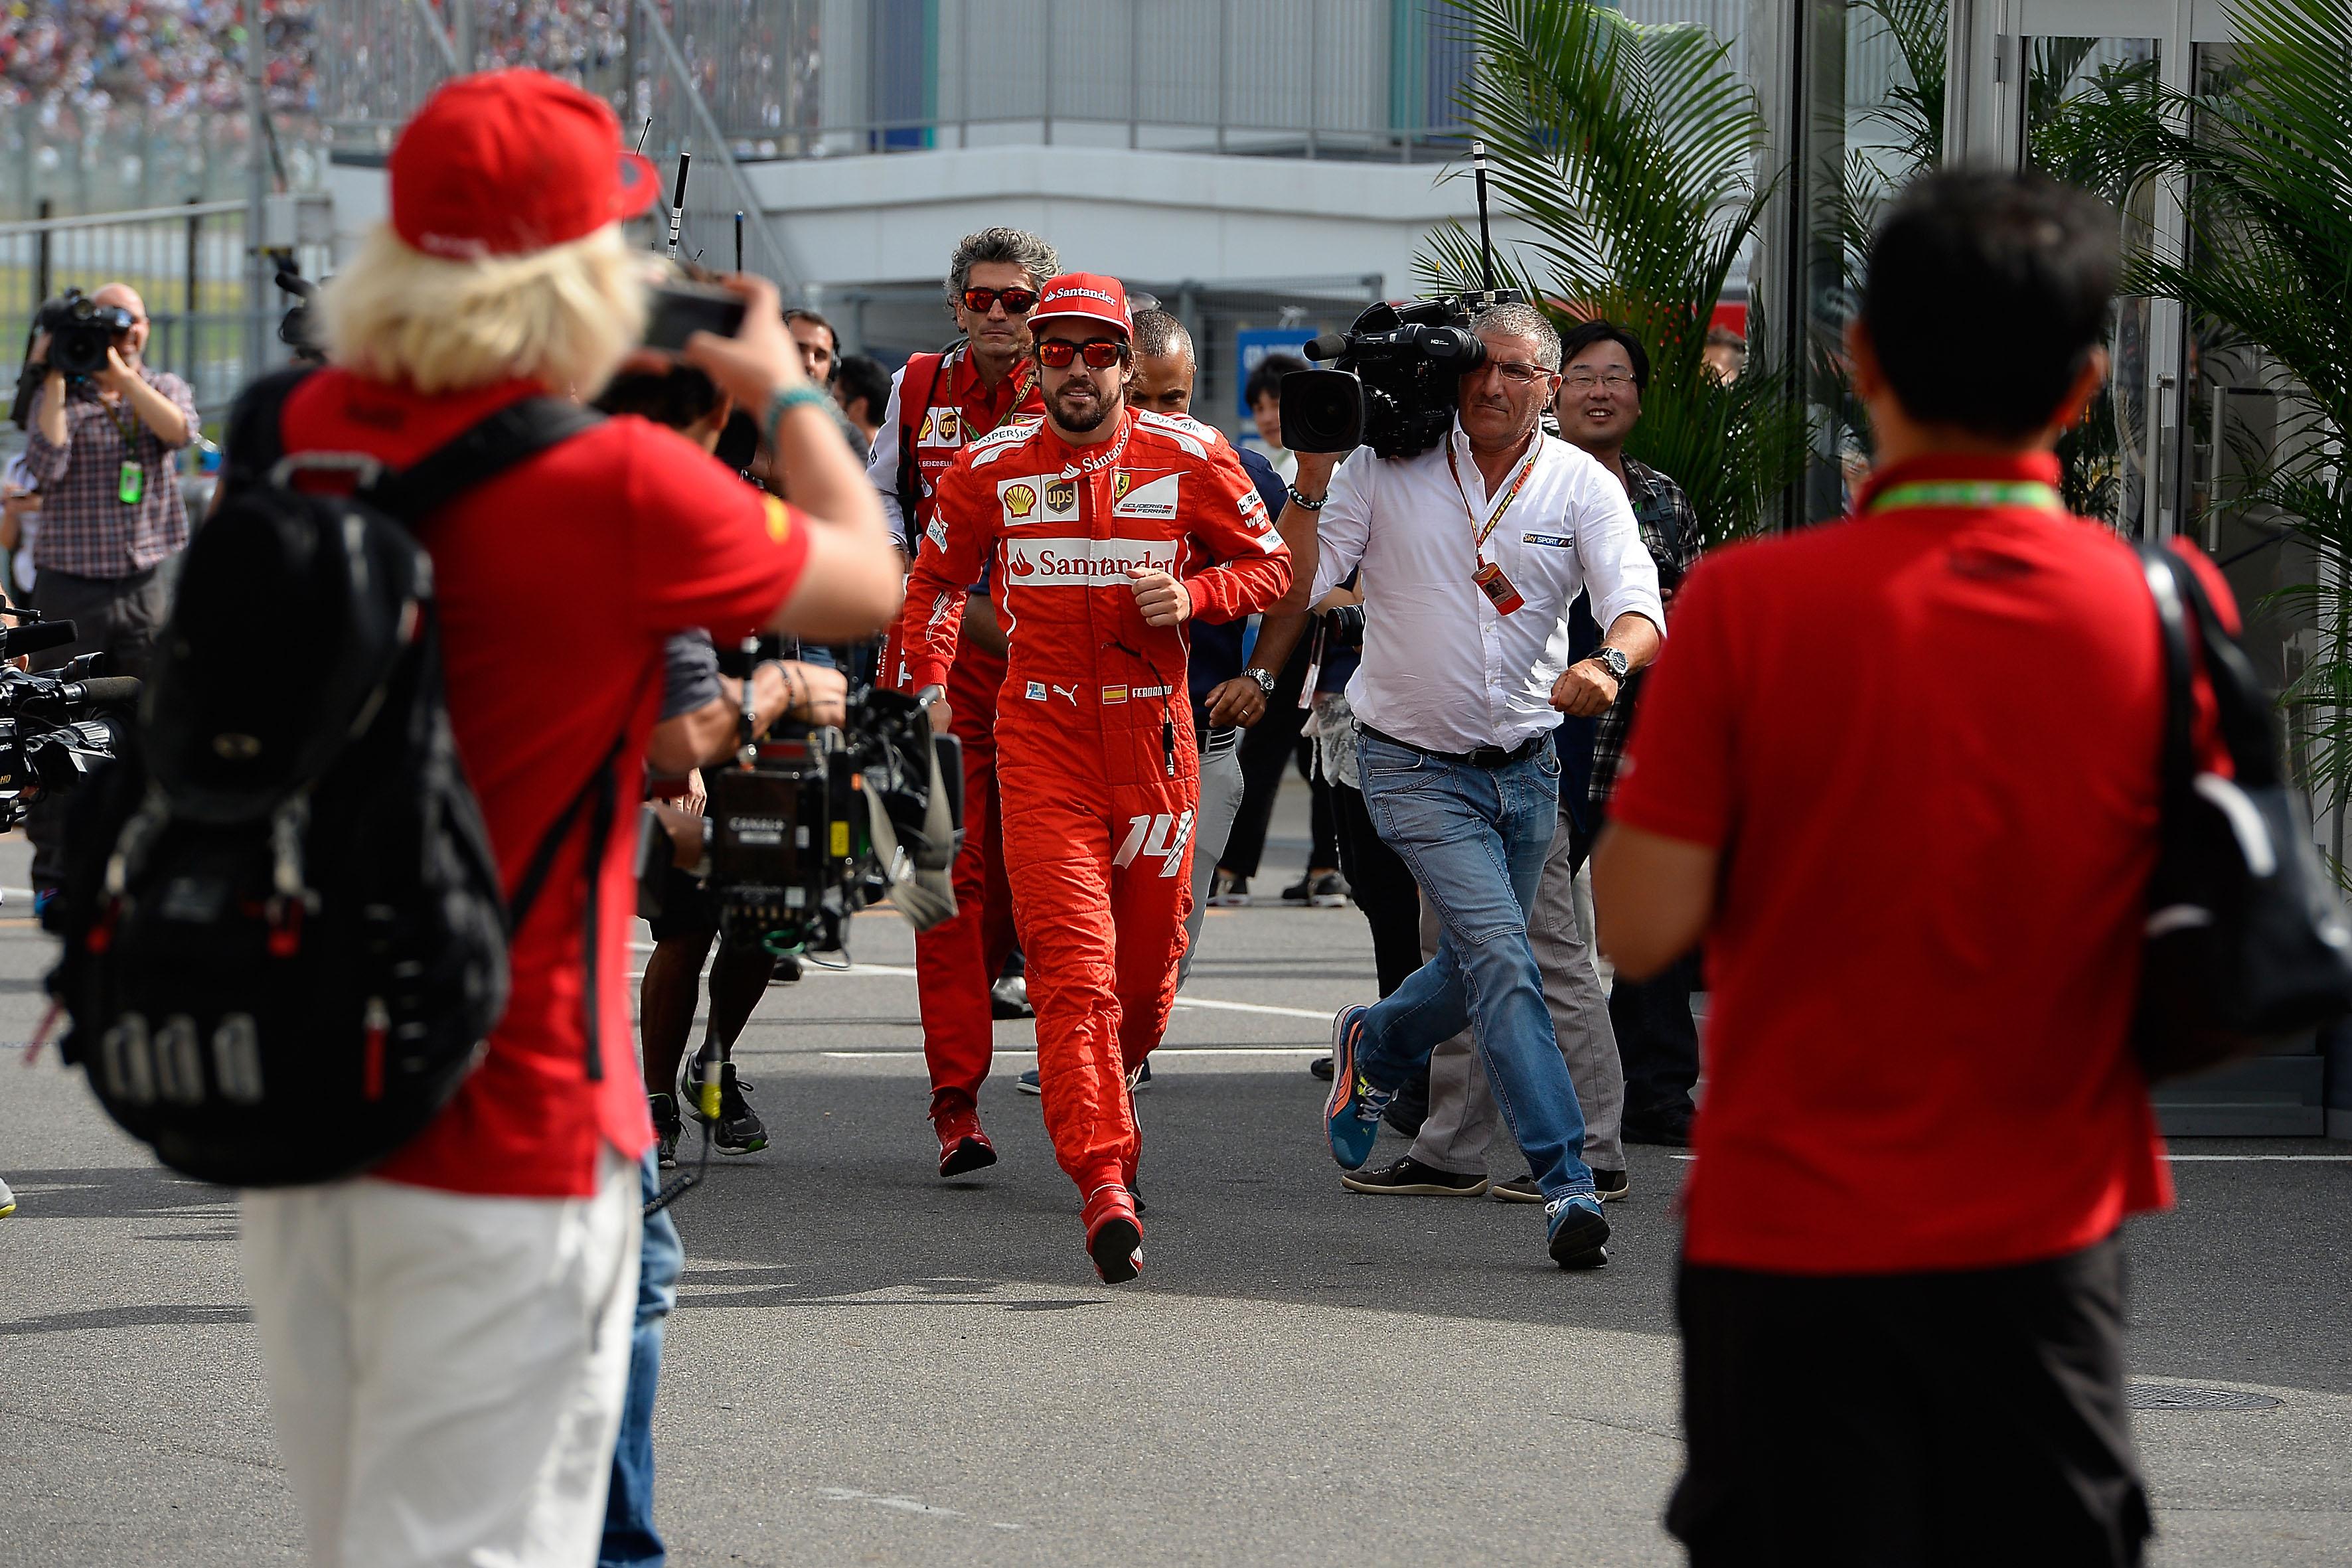 Alonso (in apparenza) non si scompone